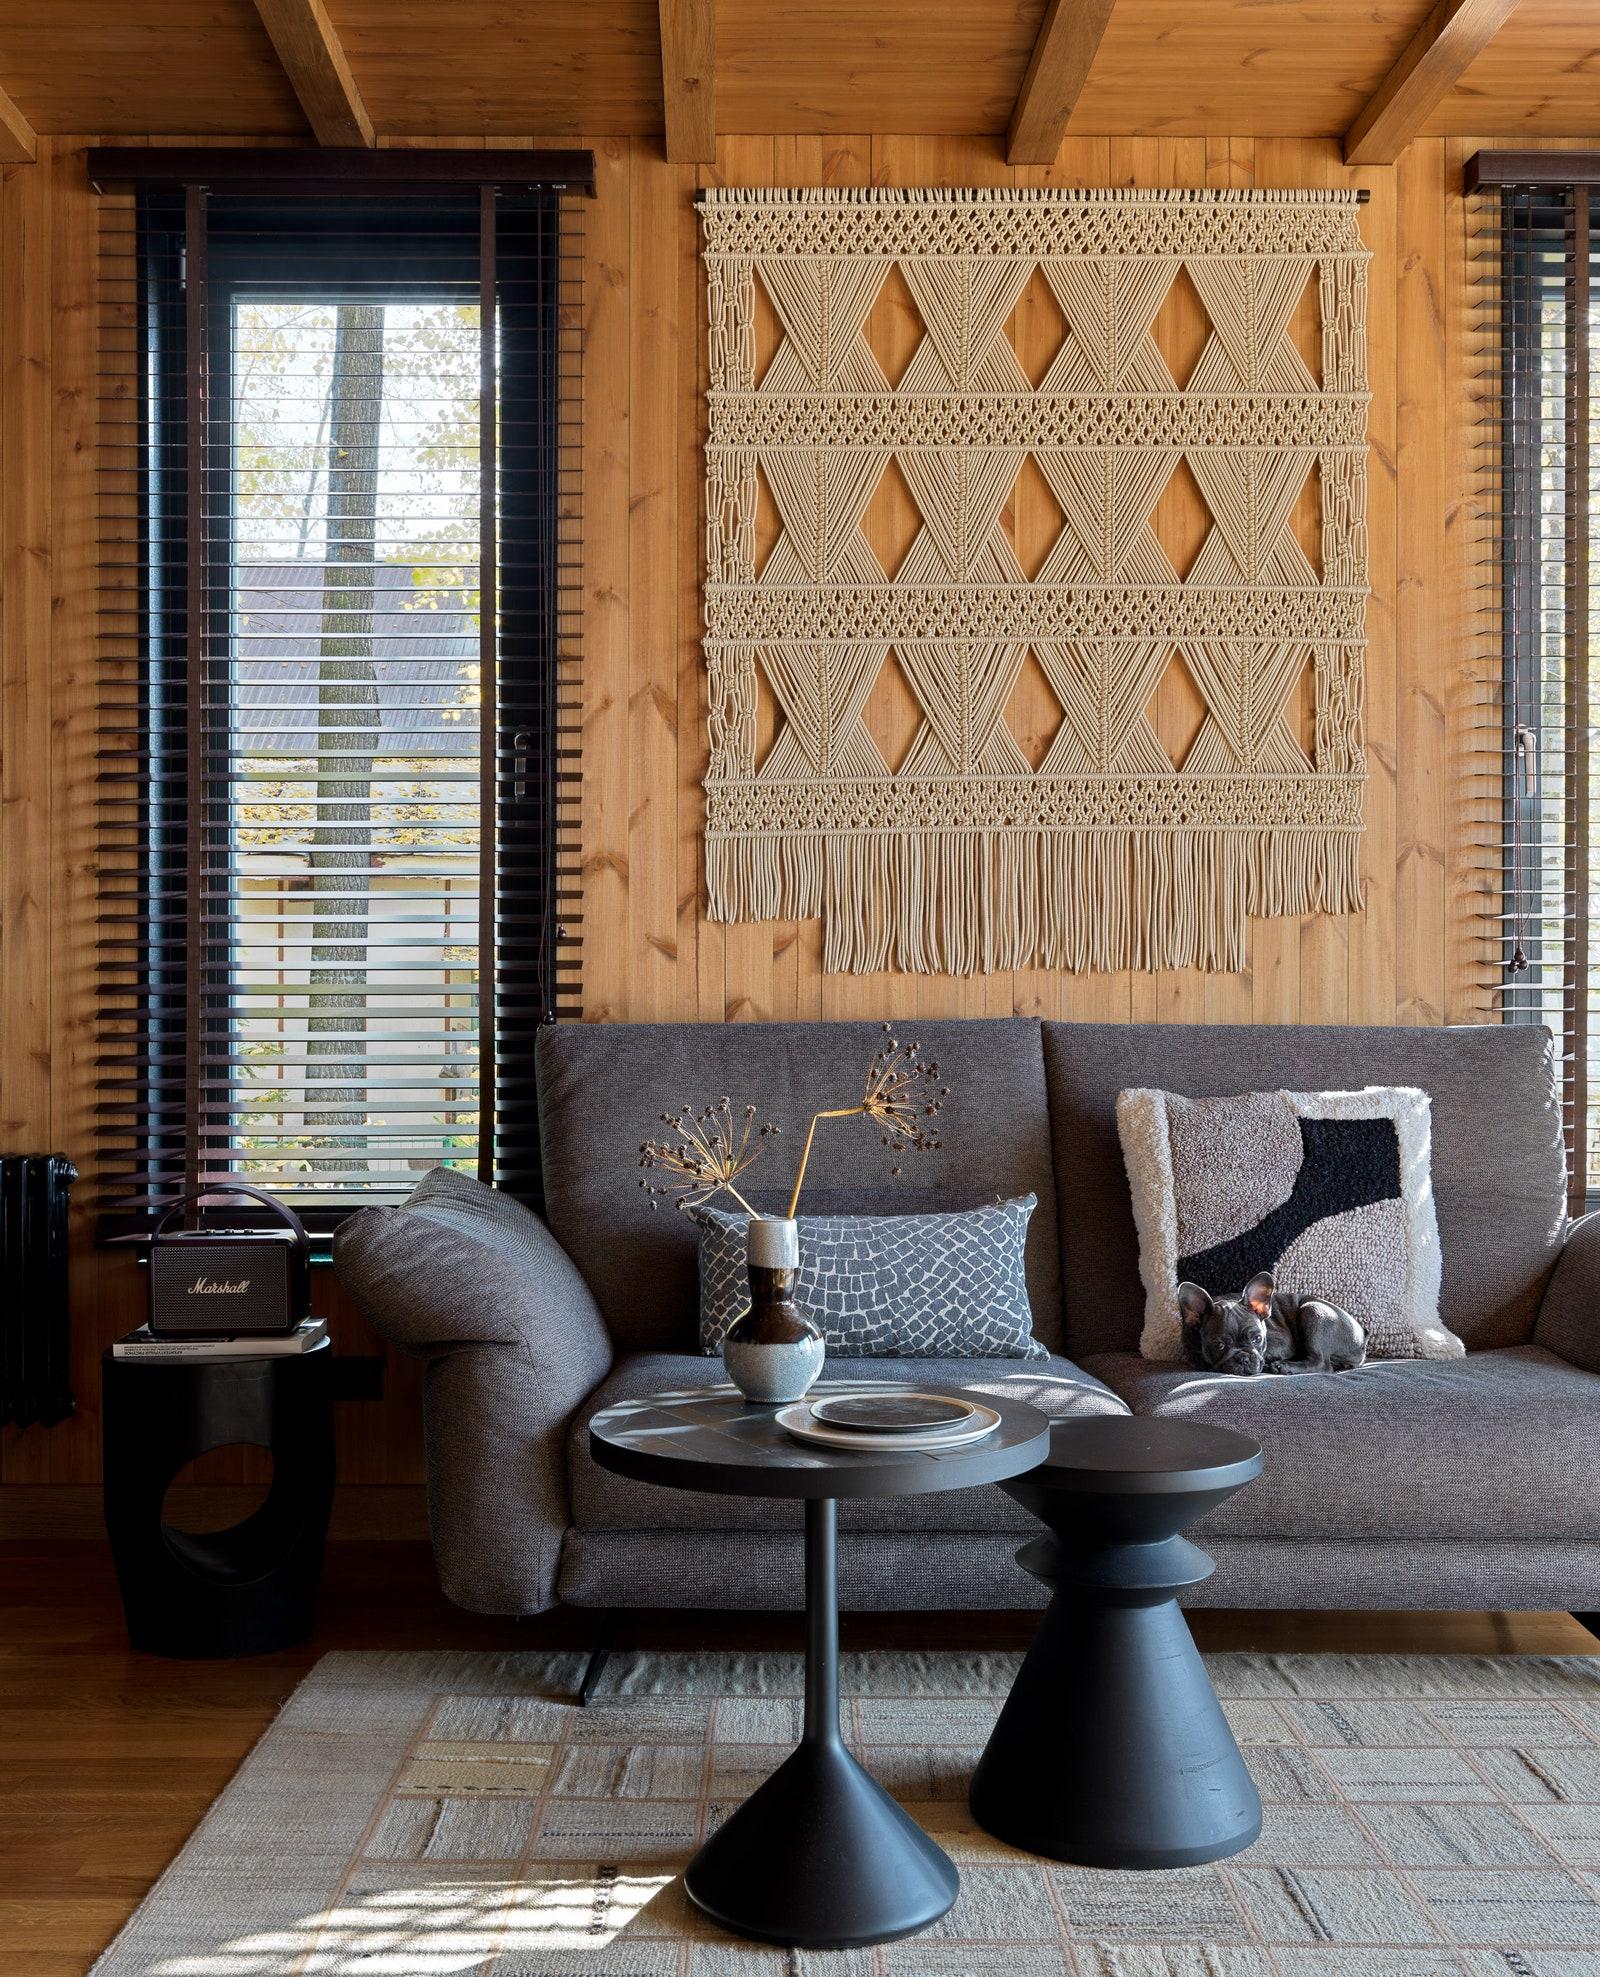 .          .  Chelsea Rosini  Atelier Home   La Redoute      Versmissen   Sempre   Design Stories          Avito        ...